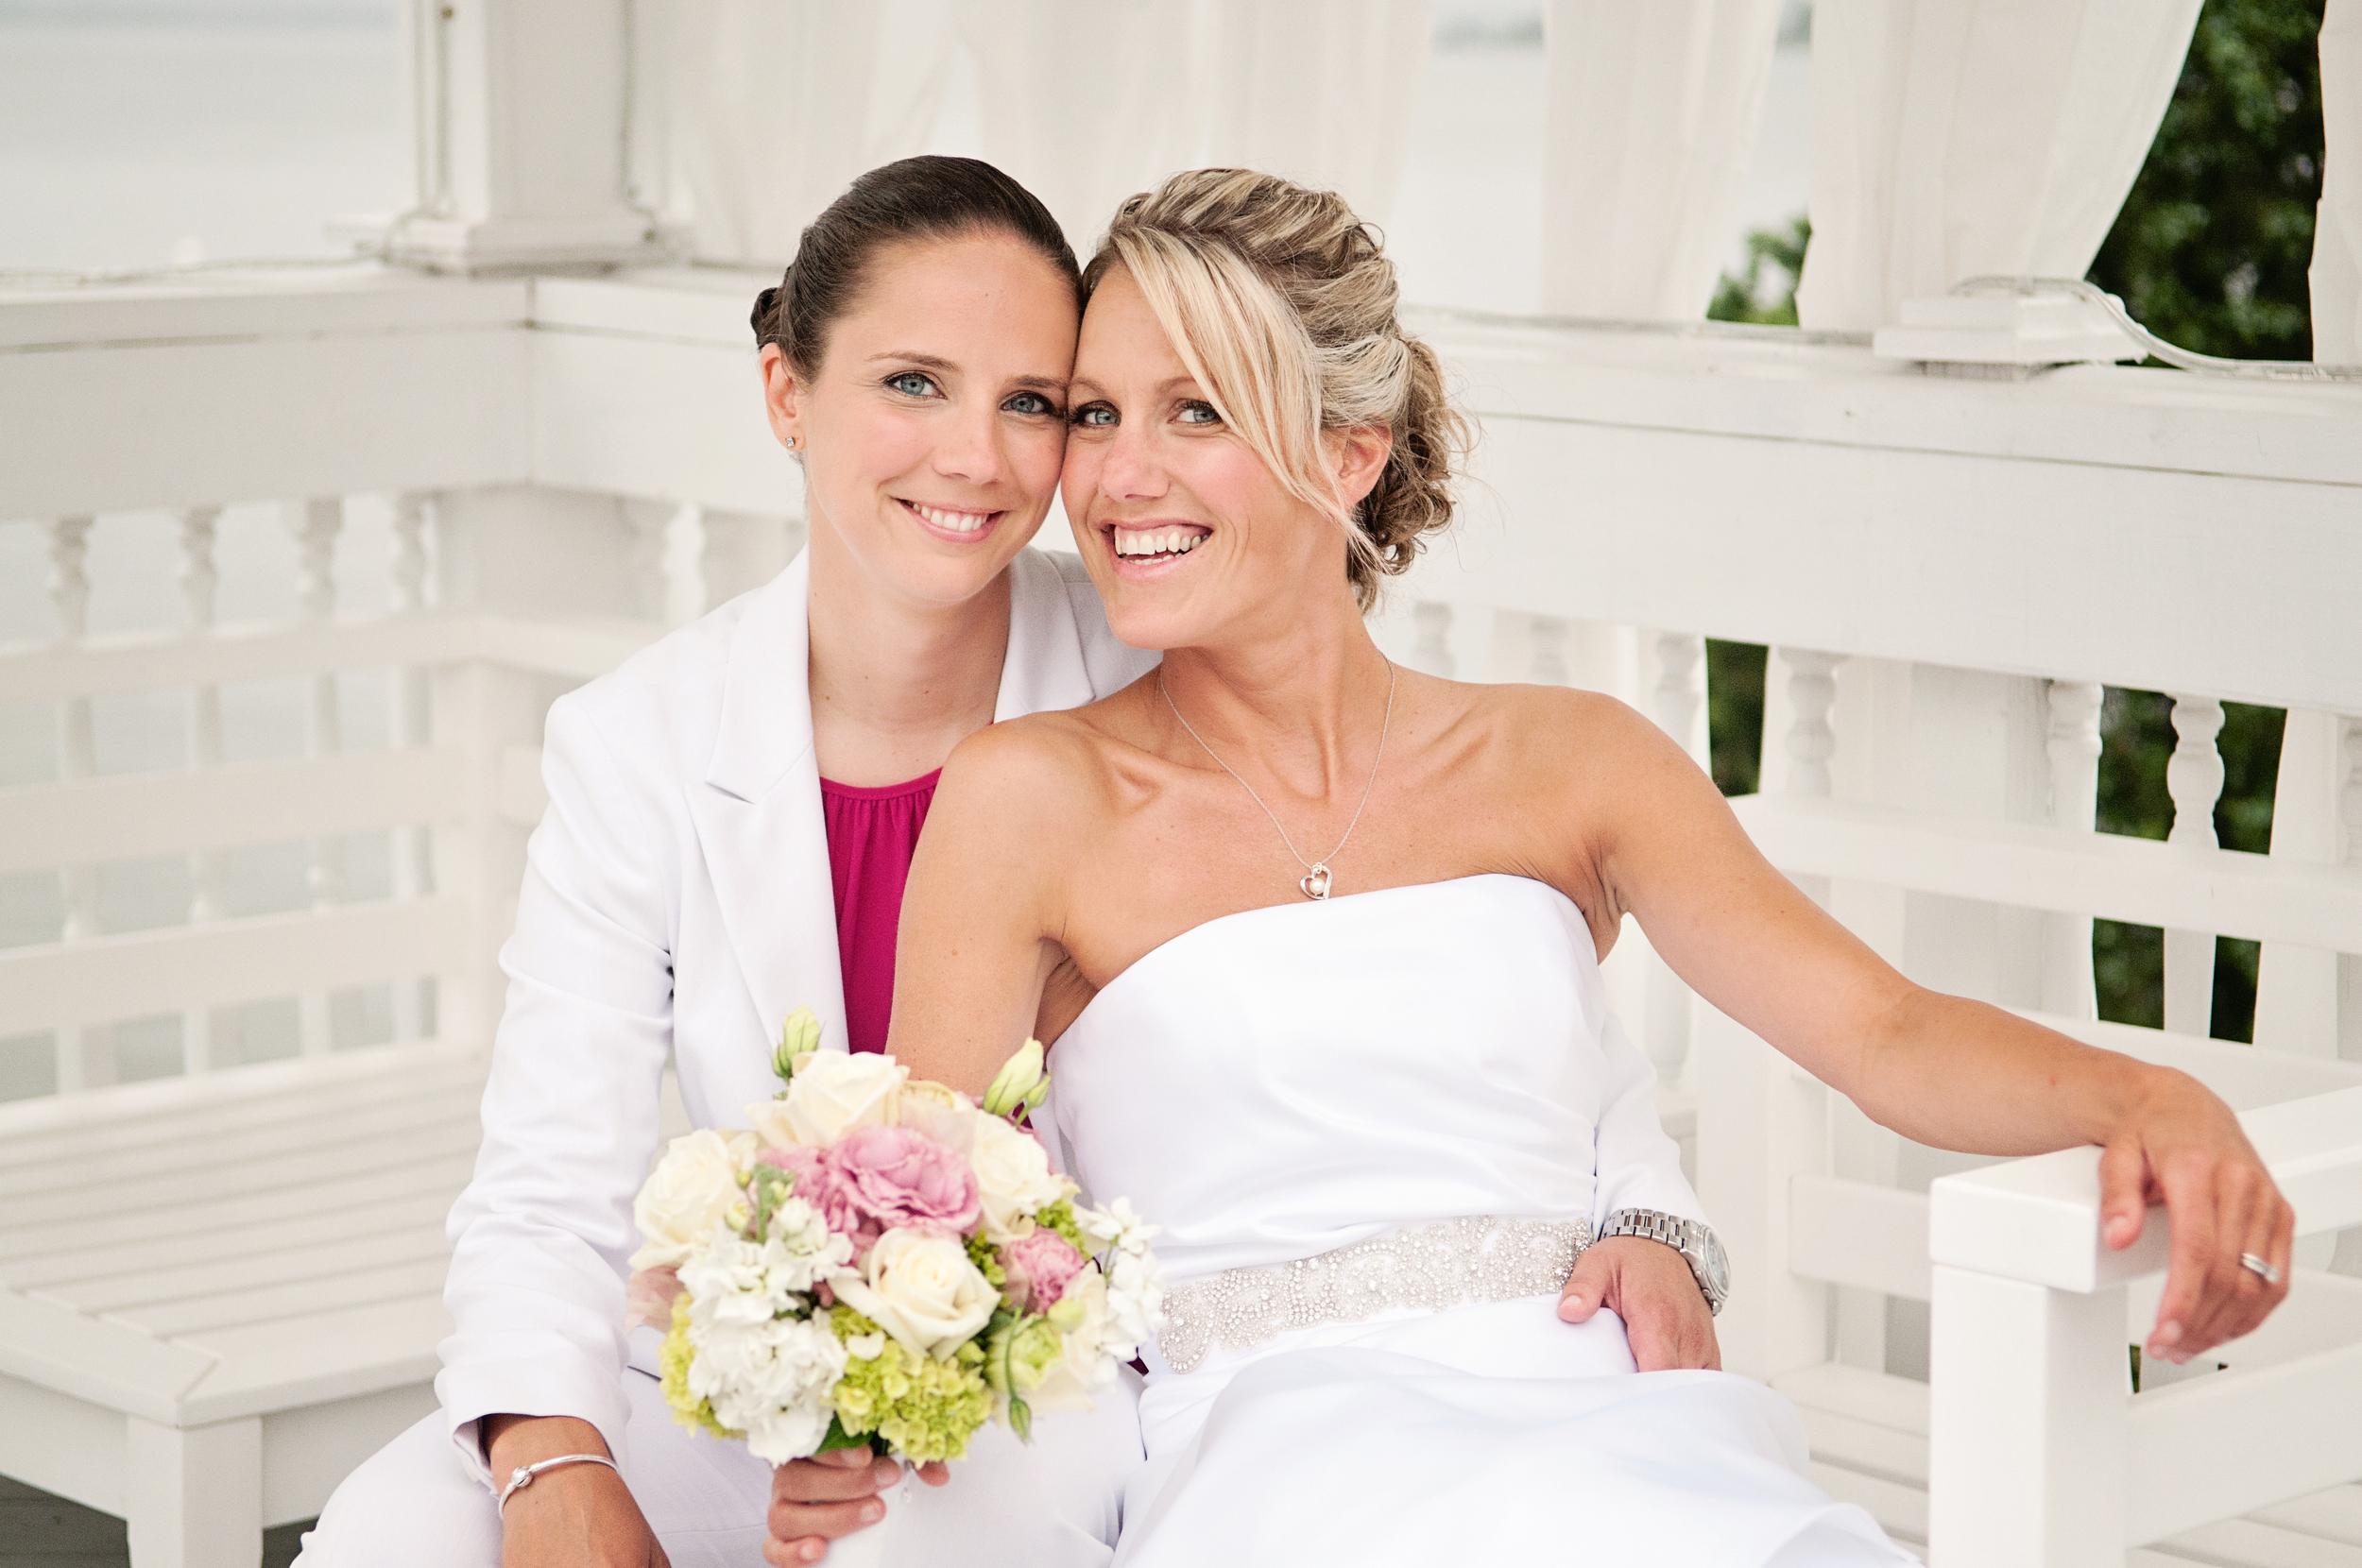 Angela_Chicoski_CT_wedding_photographer_046.jpg